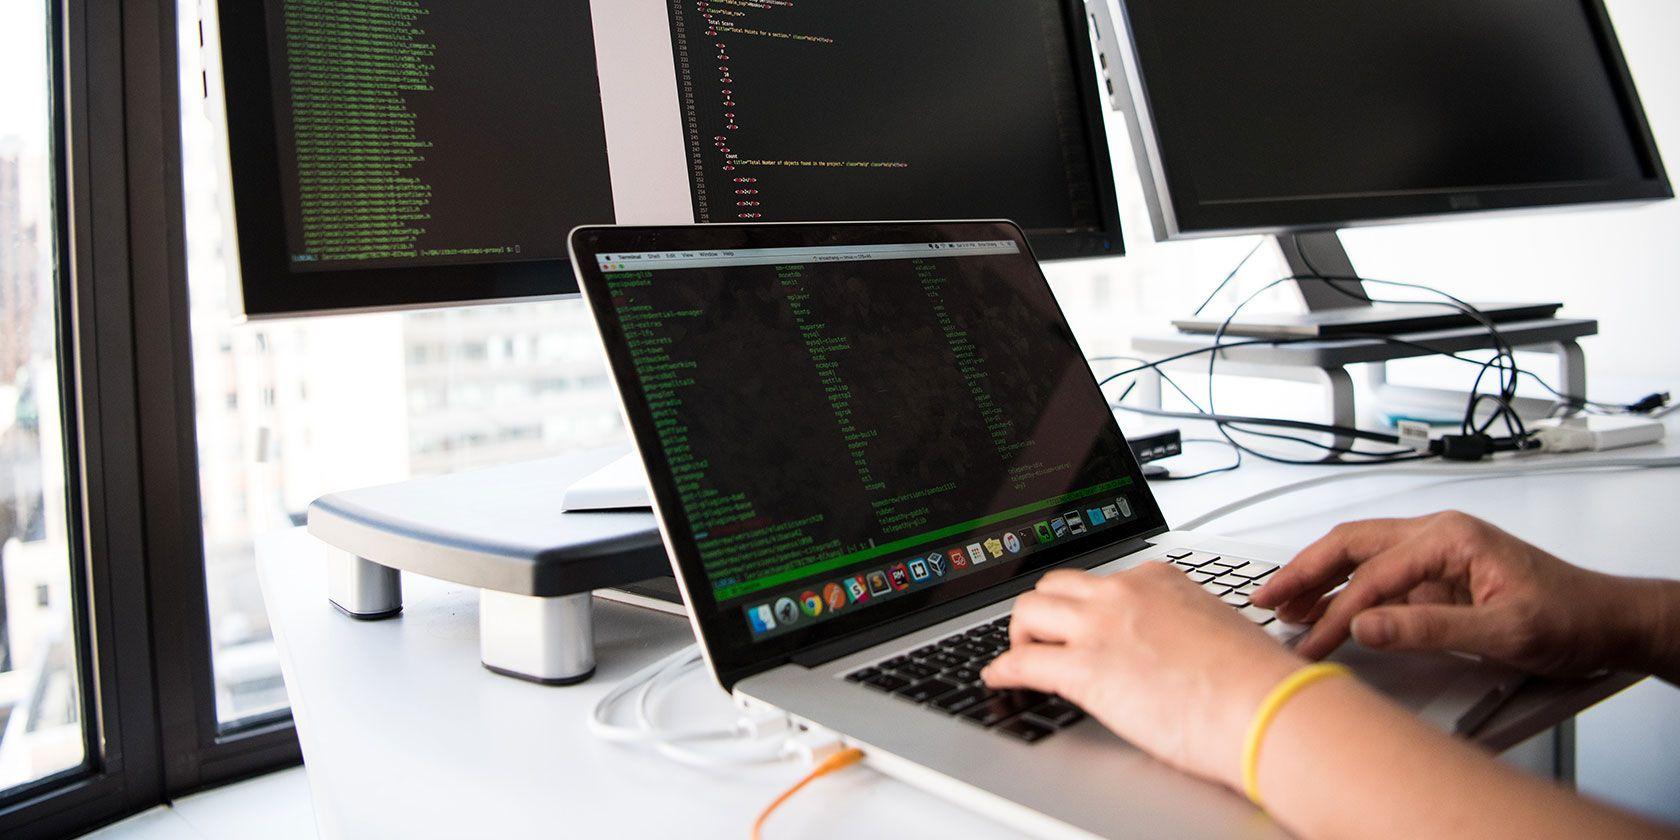 macbook-multiple-monitors